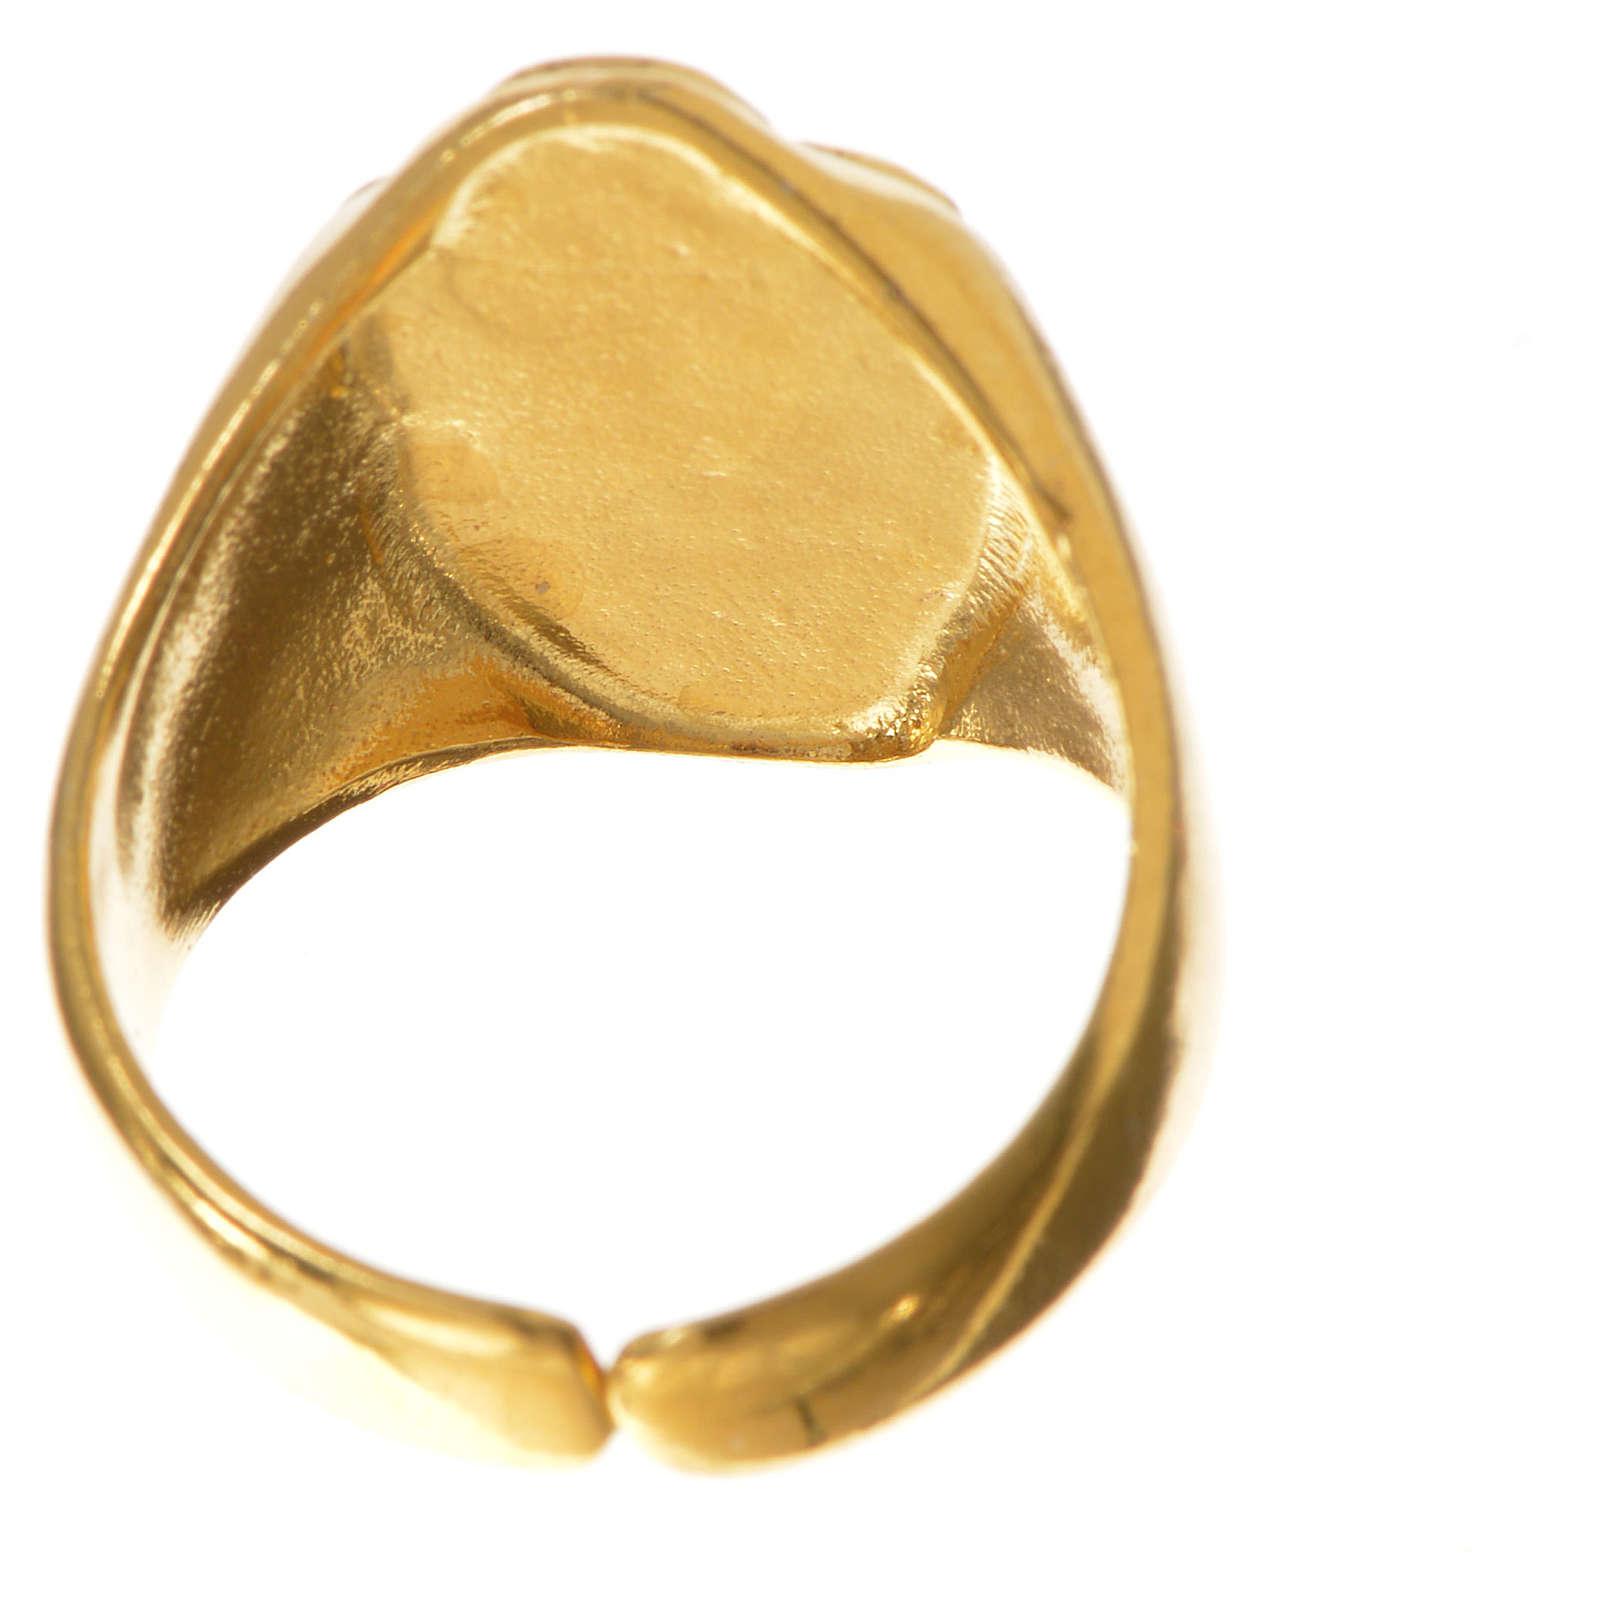 Anel bispo prata 925 dourada Passionistas 3